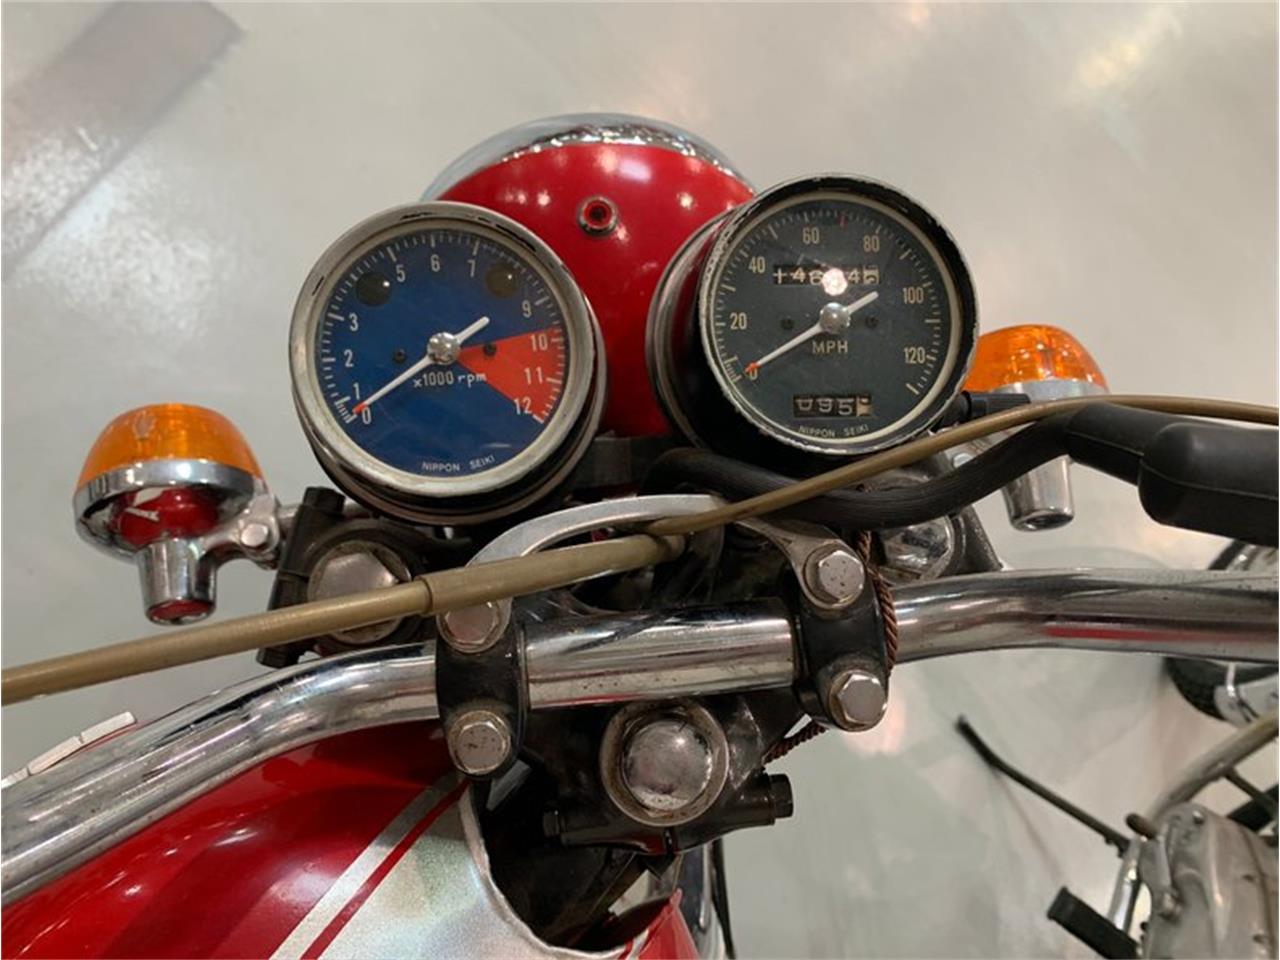 1971 Honda Motorcycle (CC-1388961) for sale in Greensboro, North Carolina